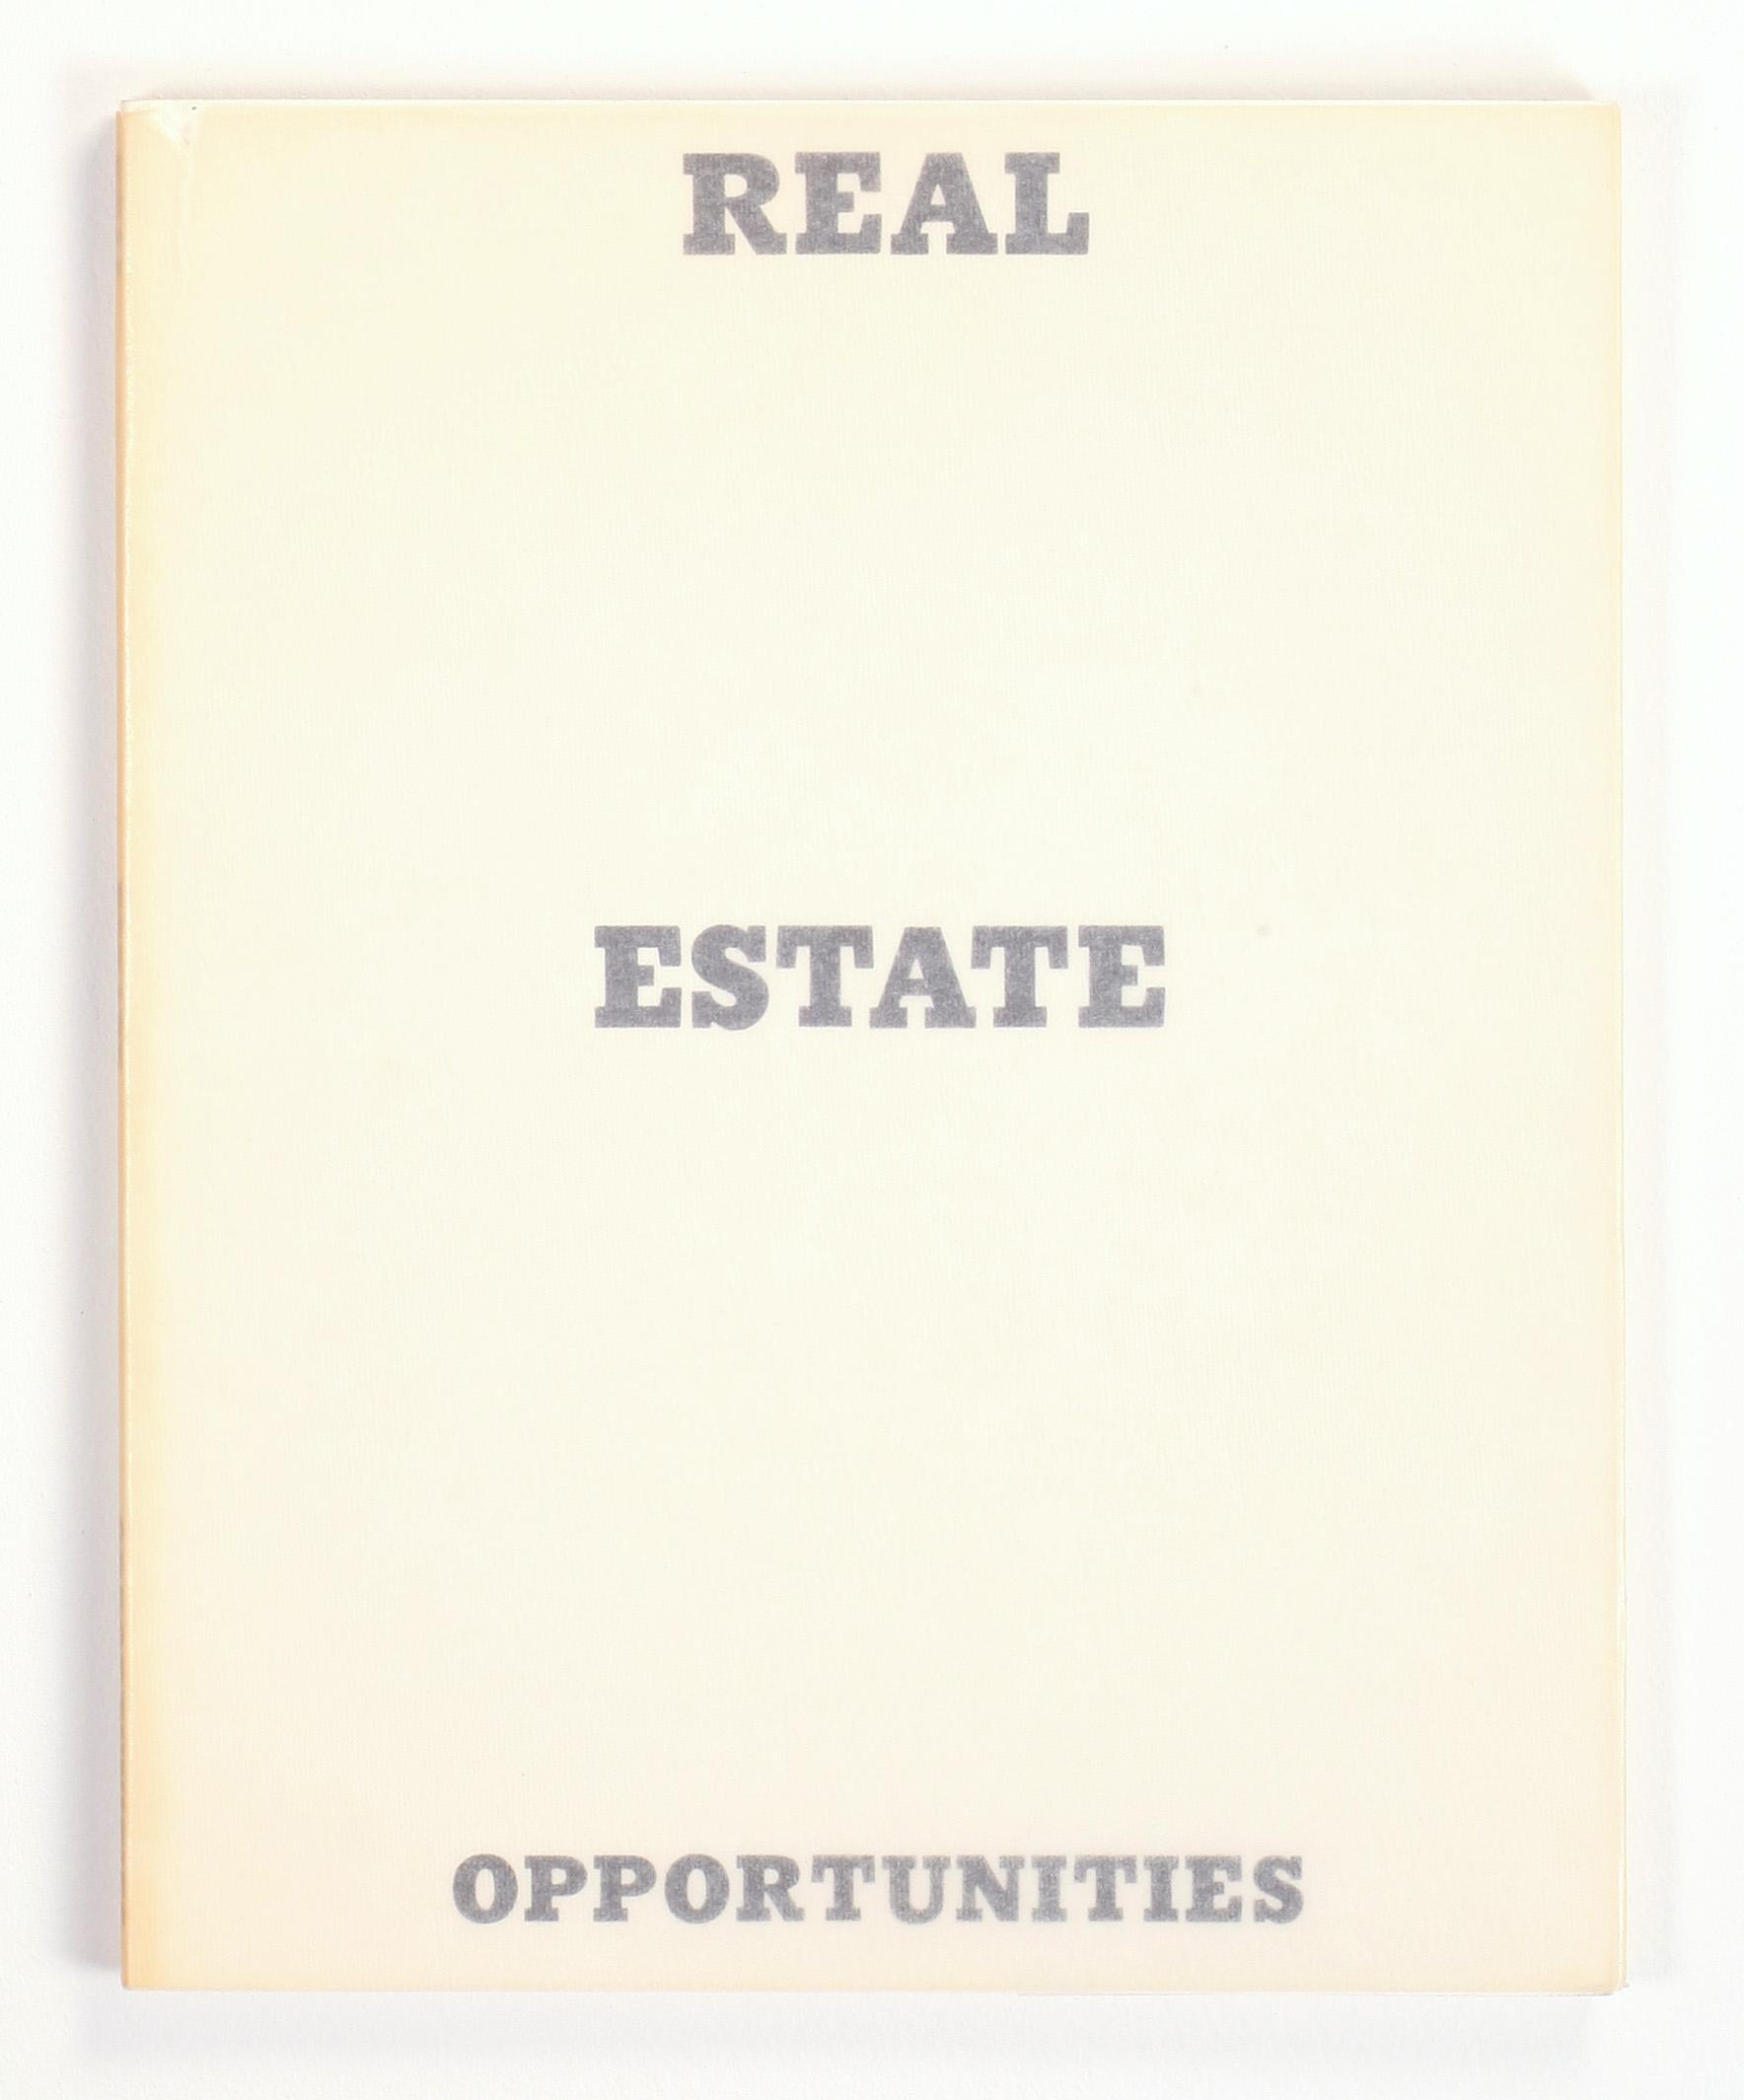 Ed_Ruscha_Real_Estate_Opportunities.JPG